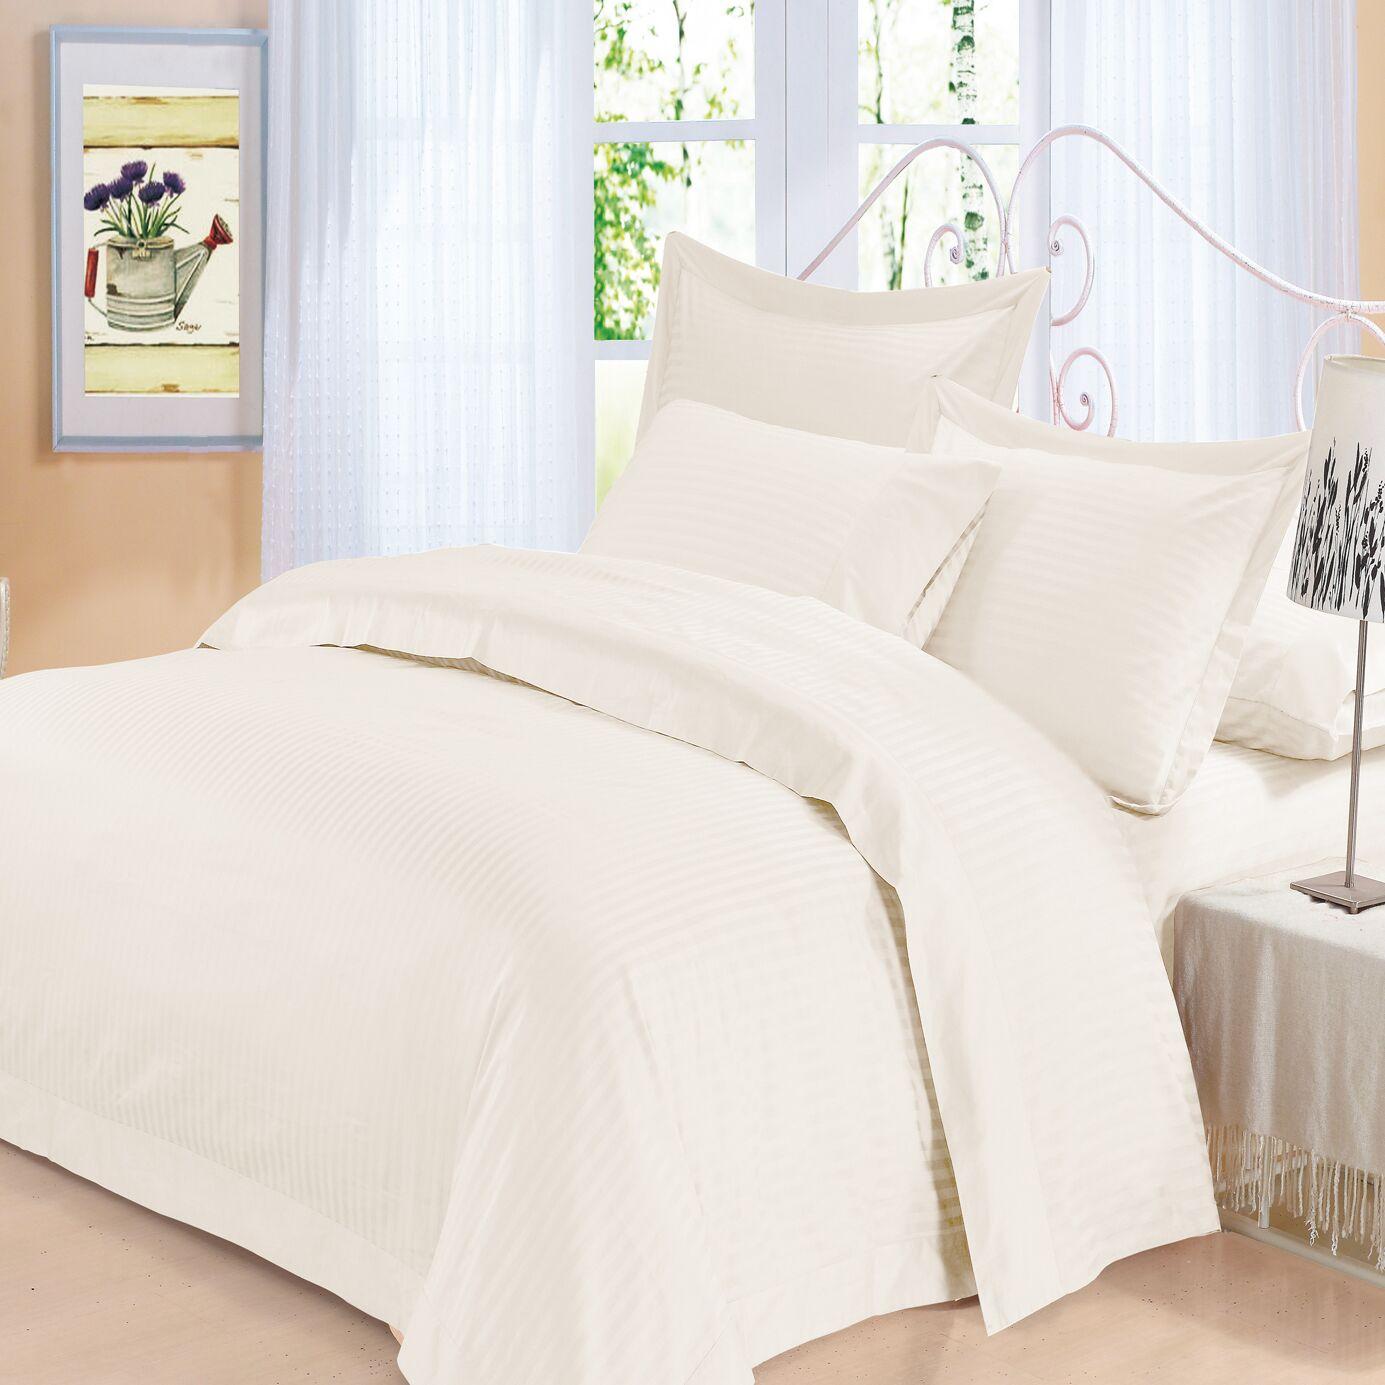 Elite 4 Piece 500 Thread Count 100% Cotton Sheet Set Color: Ivory, Size: King